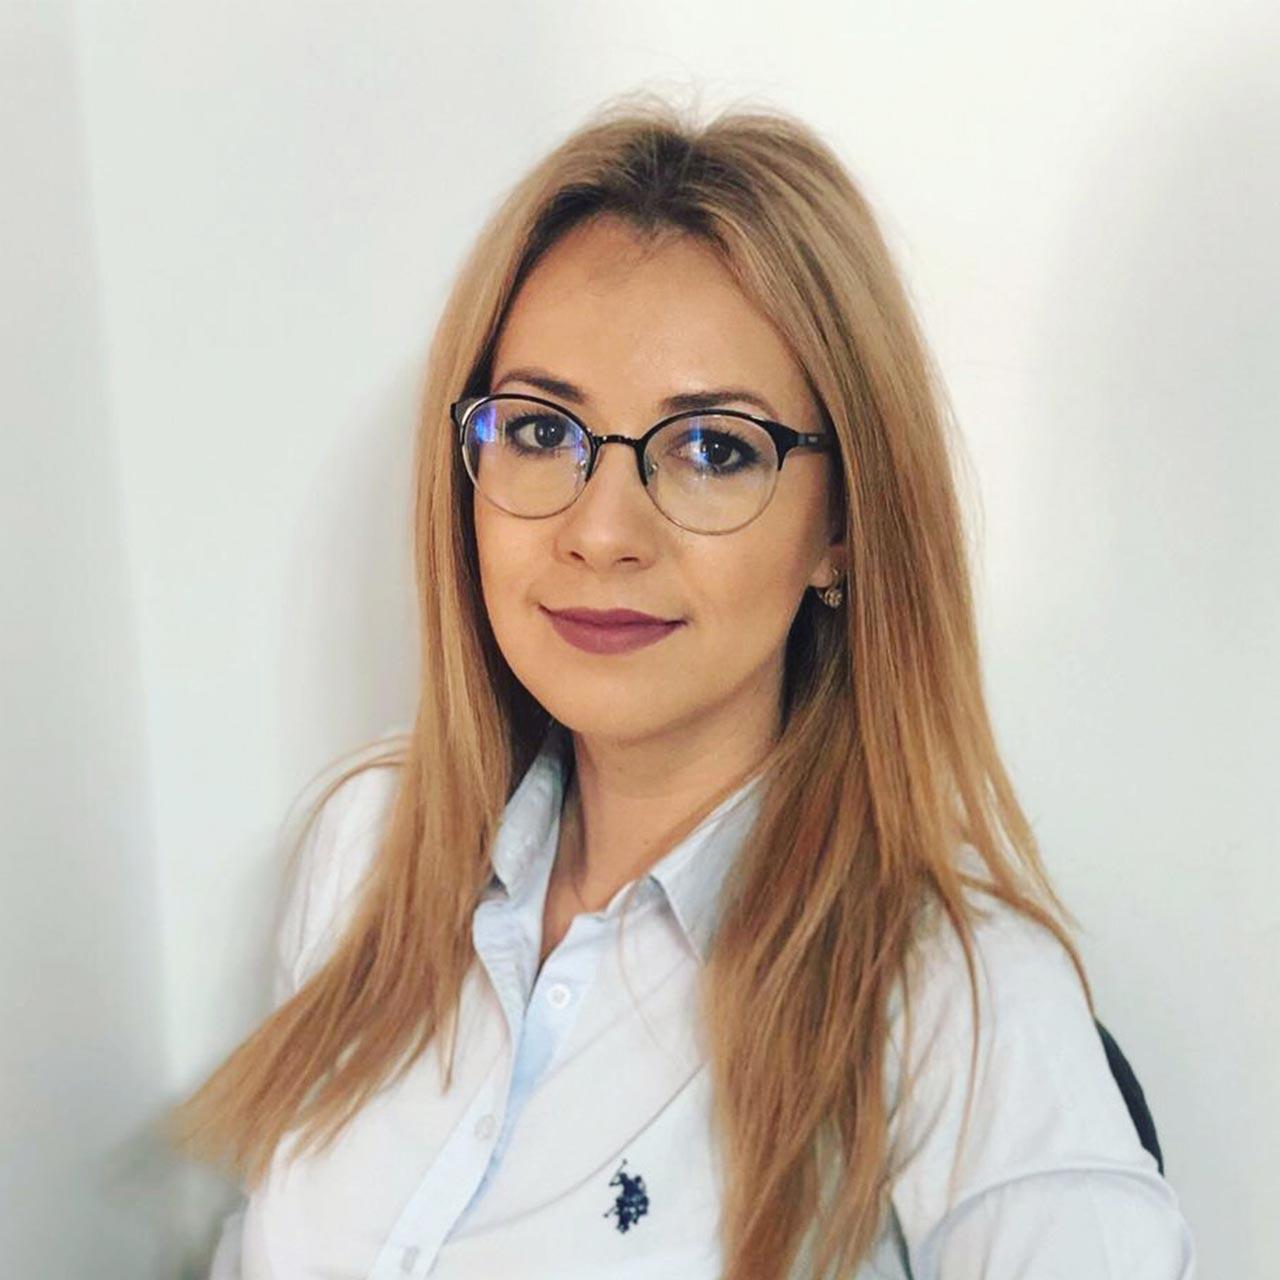 Carla Vlagea